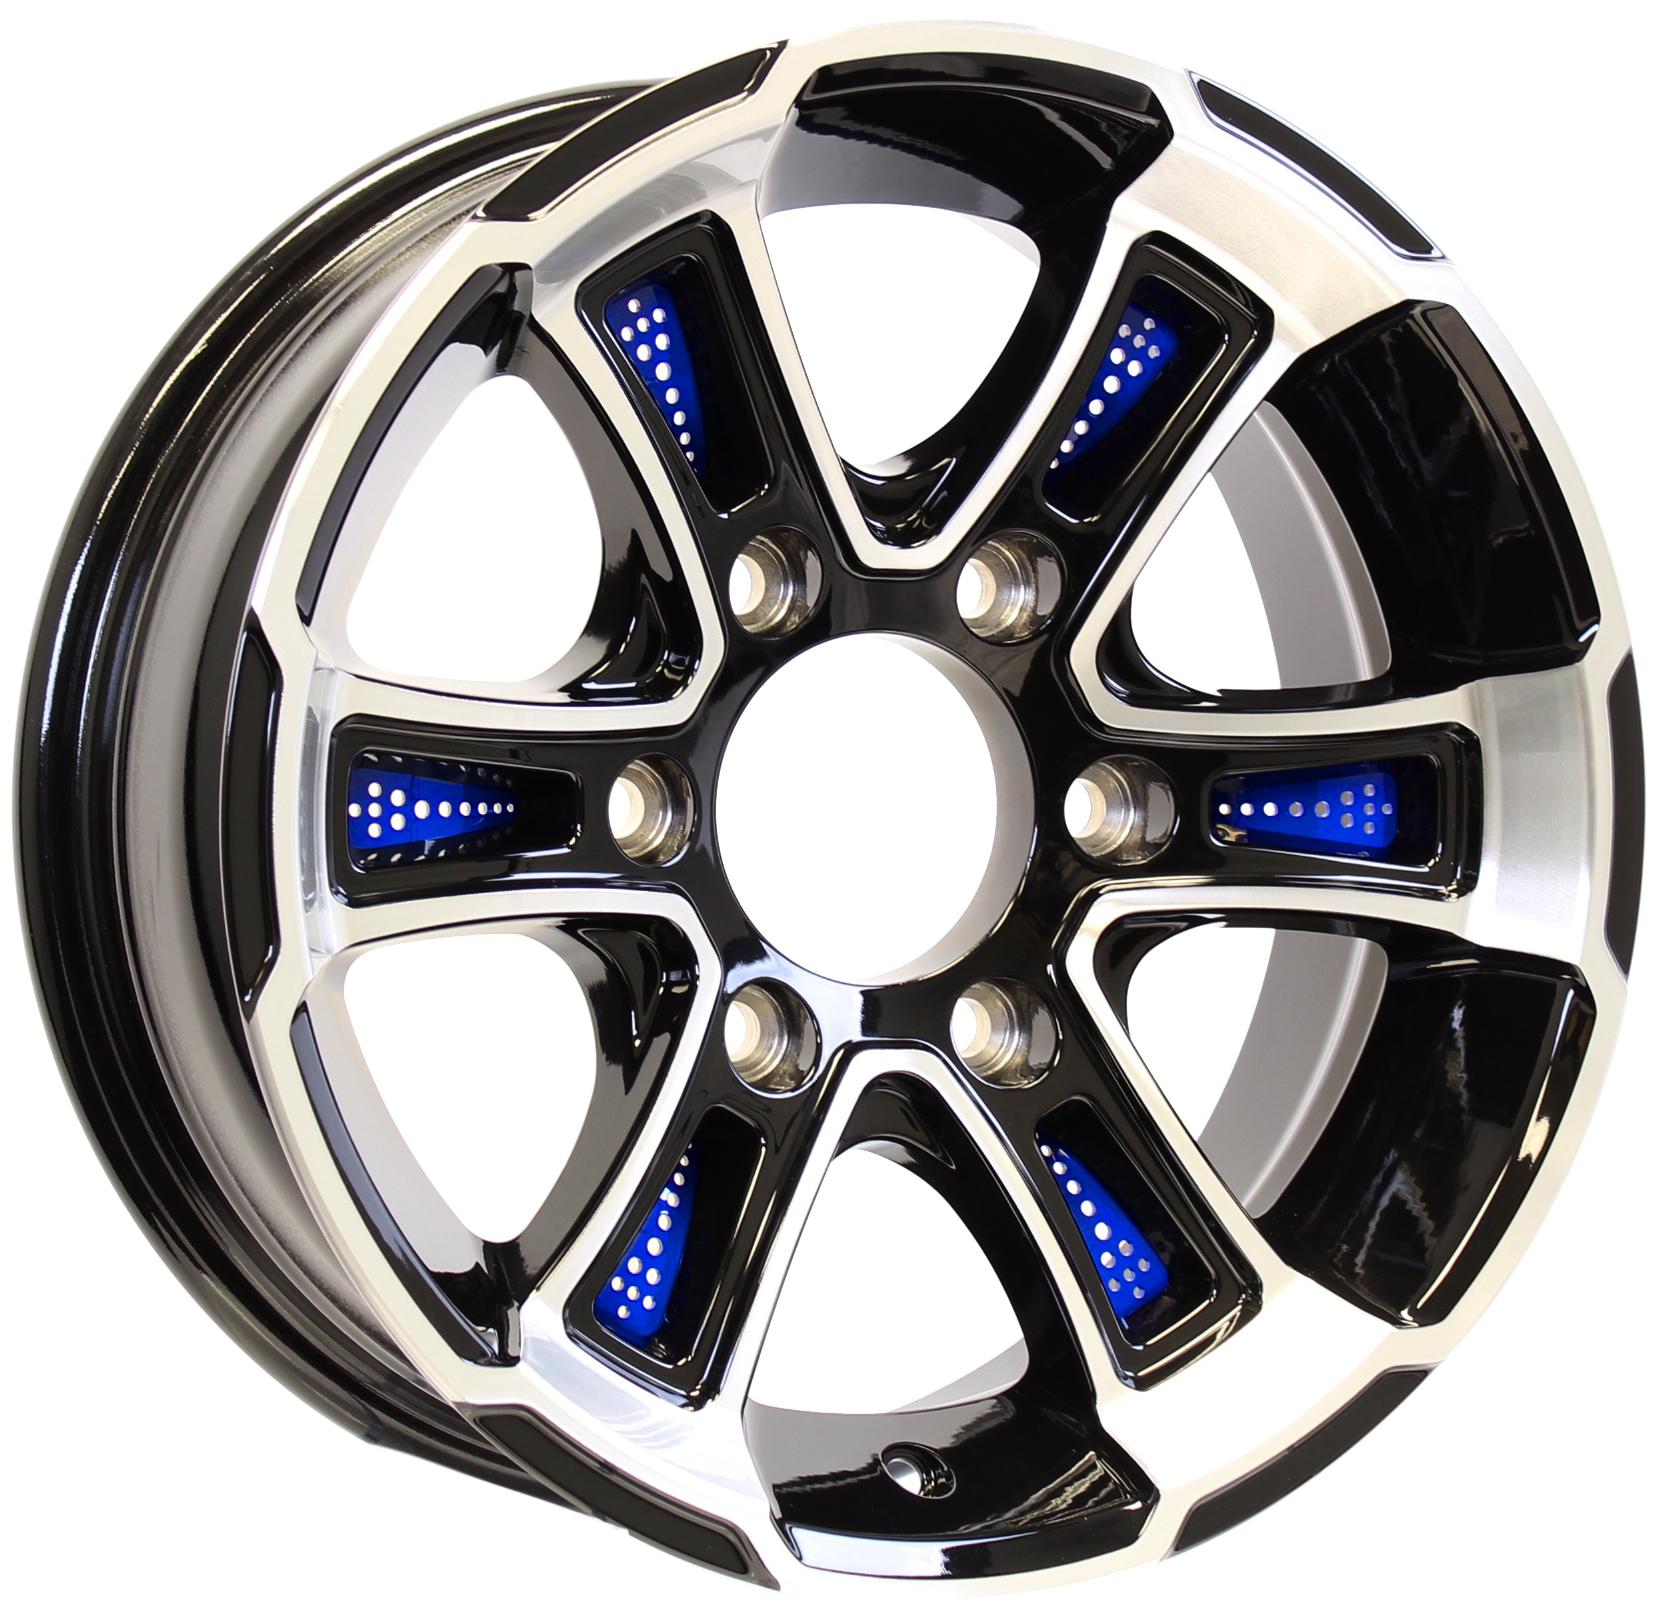 Whitehawk 15x6 6-5.5 Black Aluminum Trailer Wheel with Blue Inserts Image